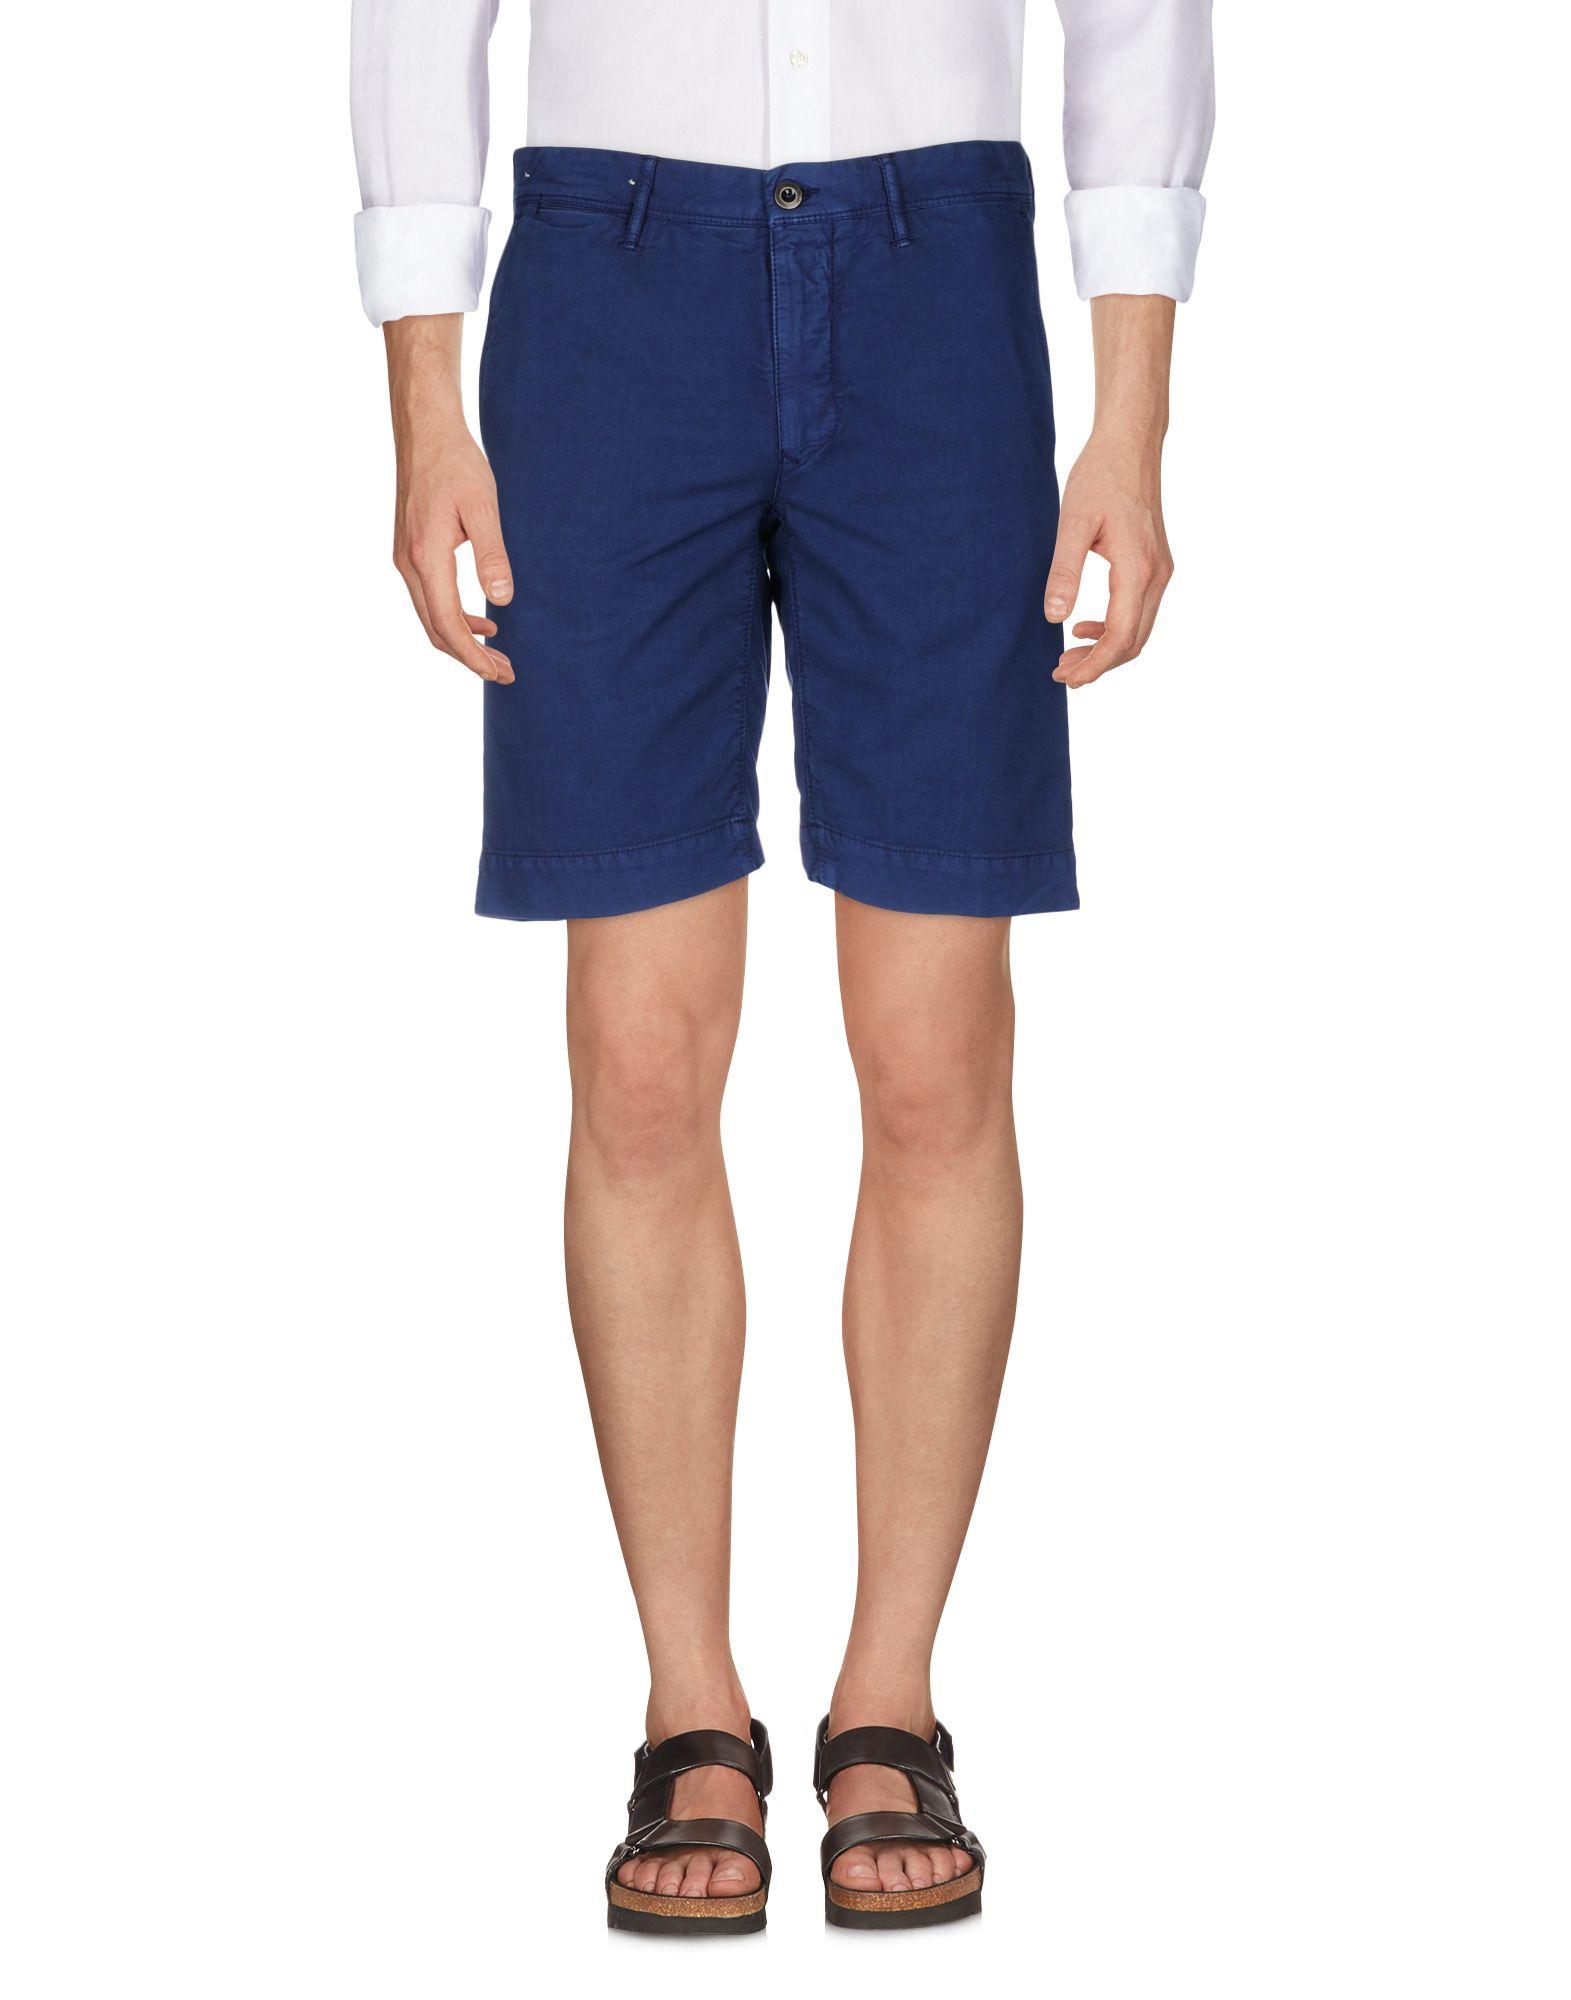 Shorts Incotex Uomo - Acquista online su